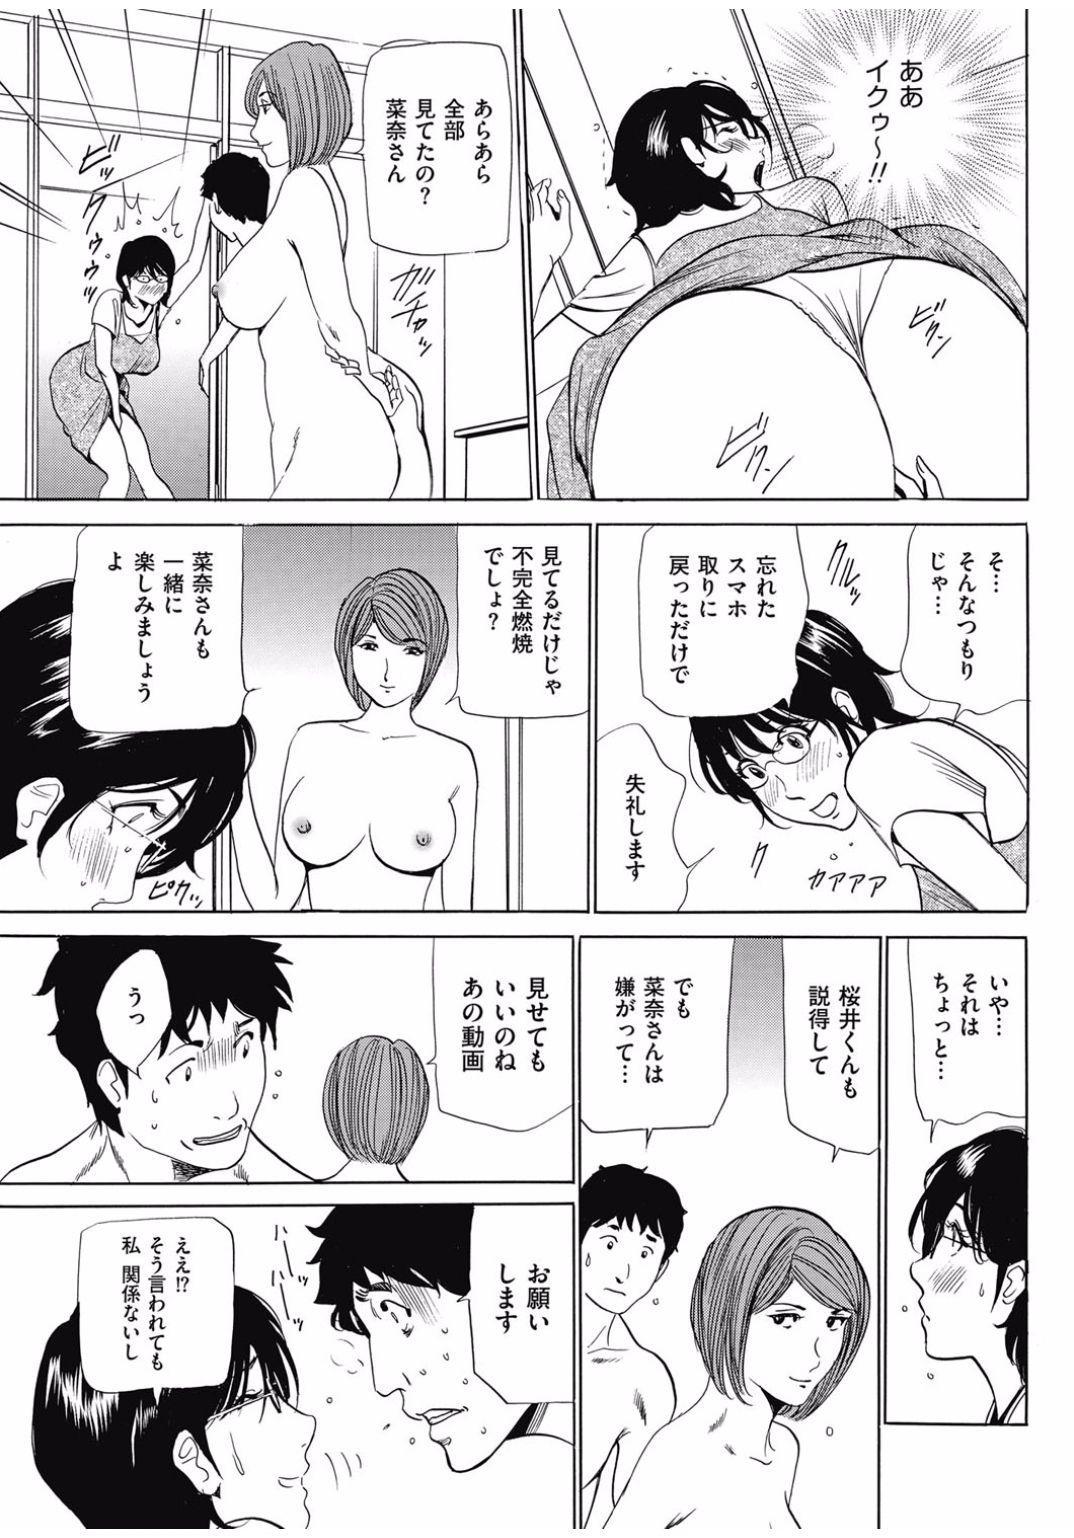 Wa Usuki Ipa a 1-10 85